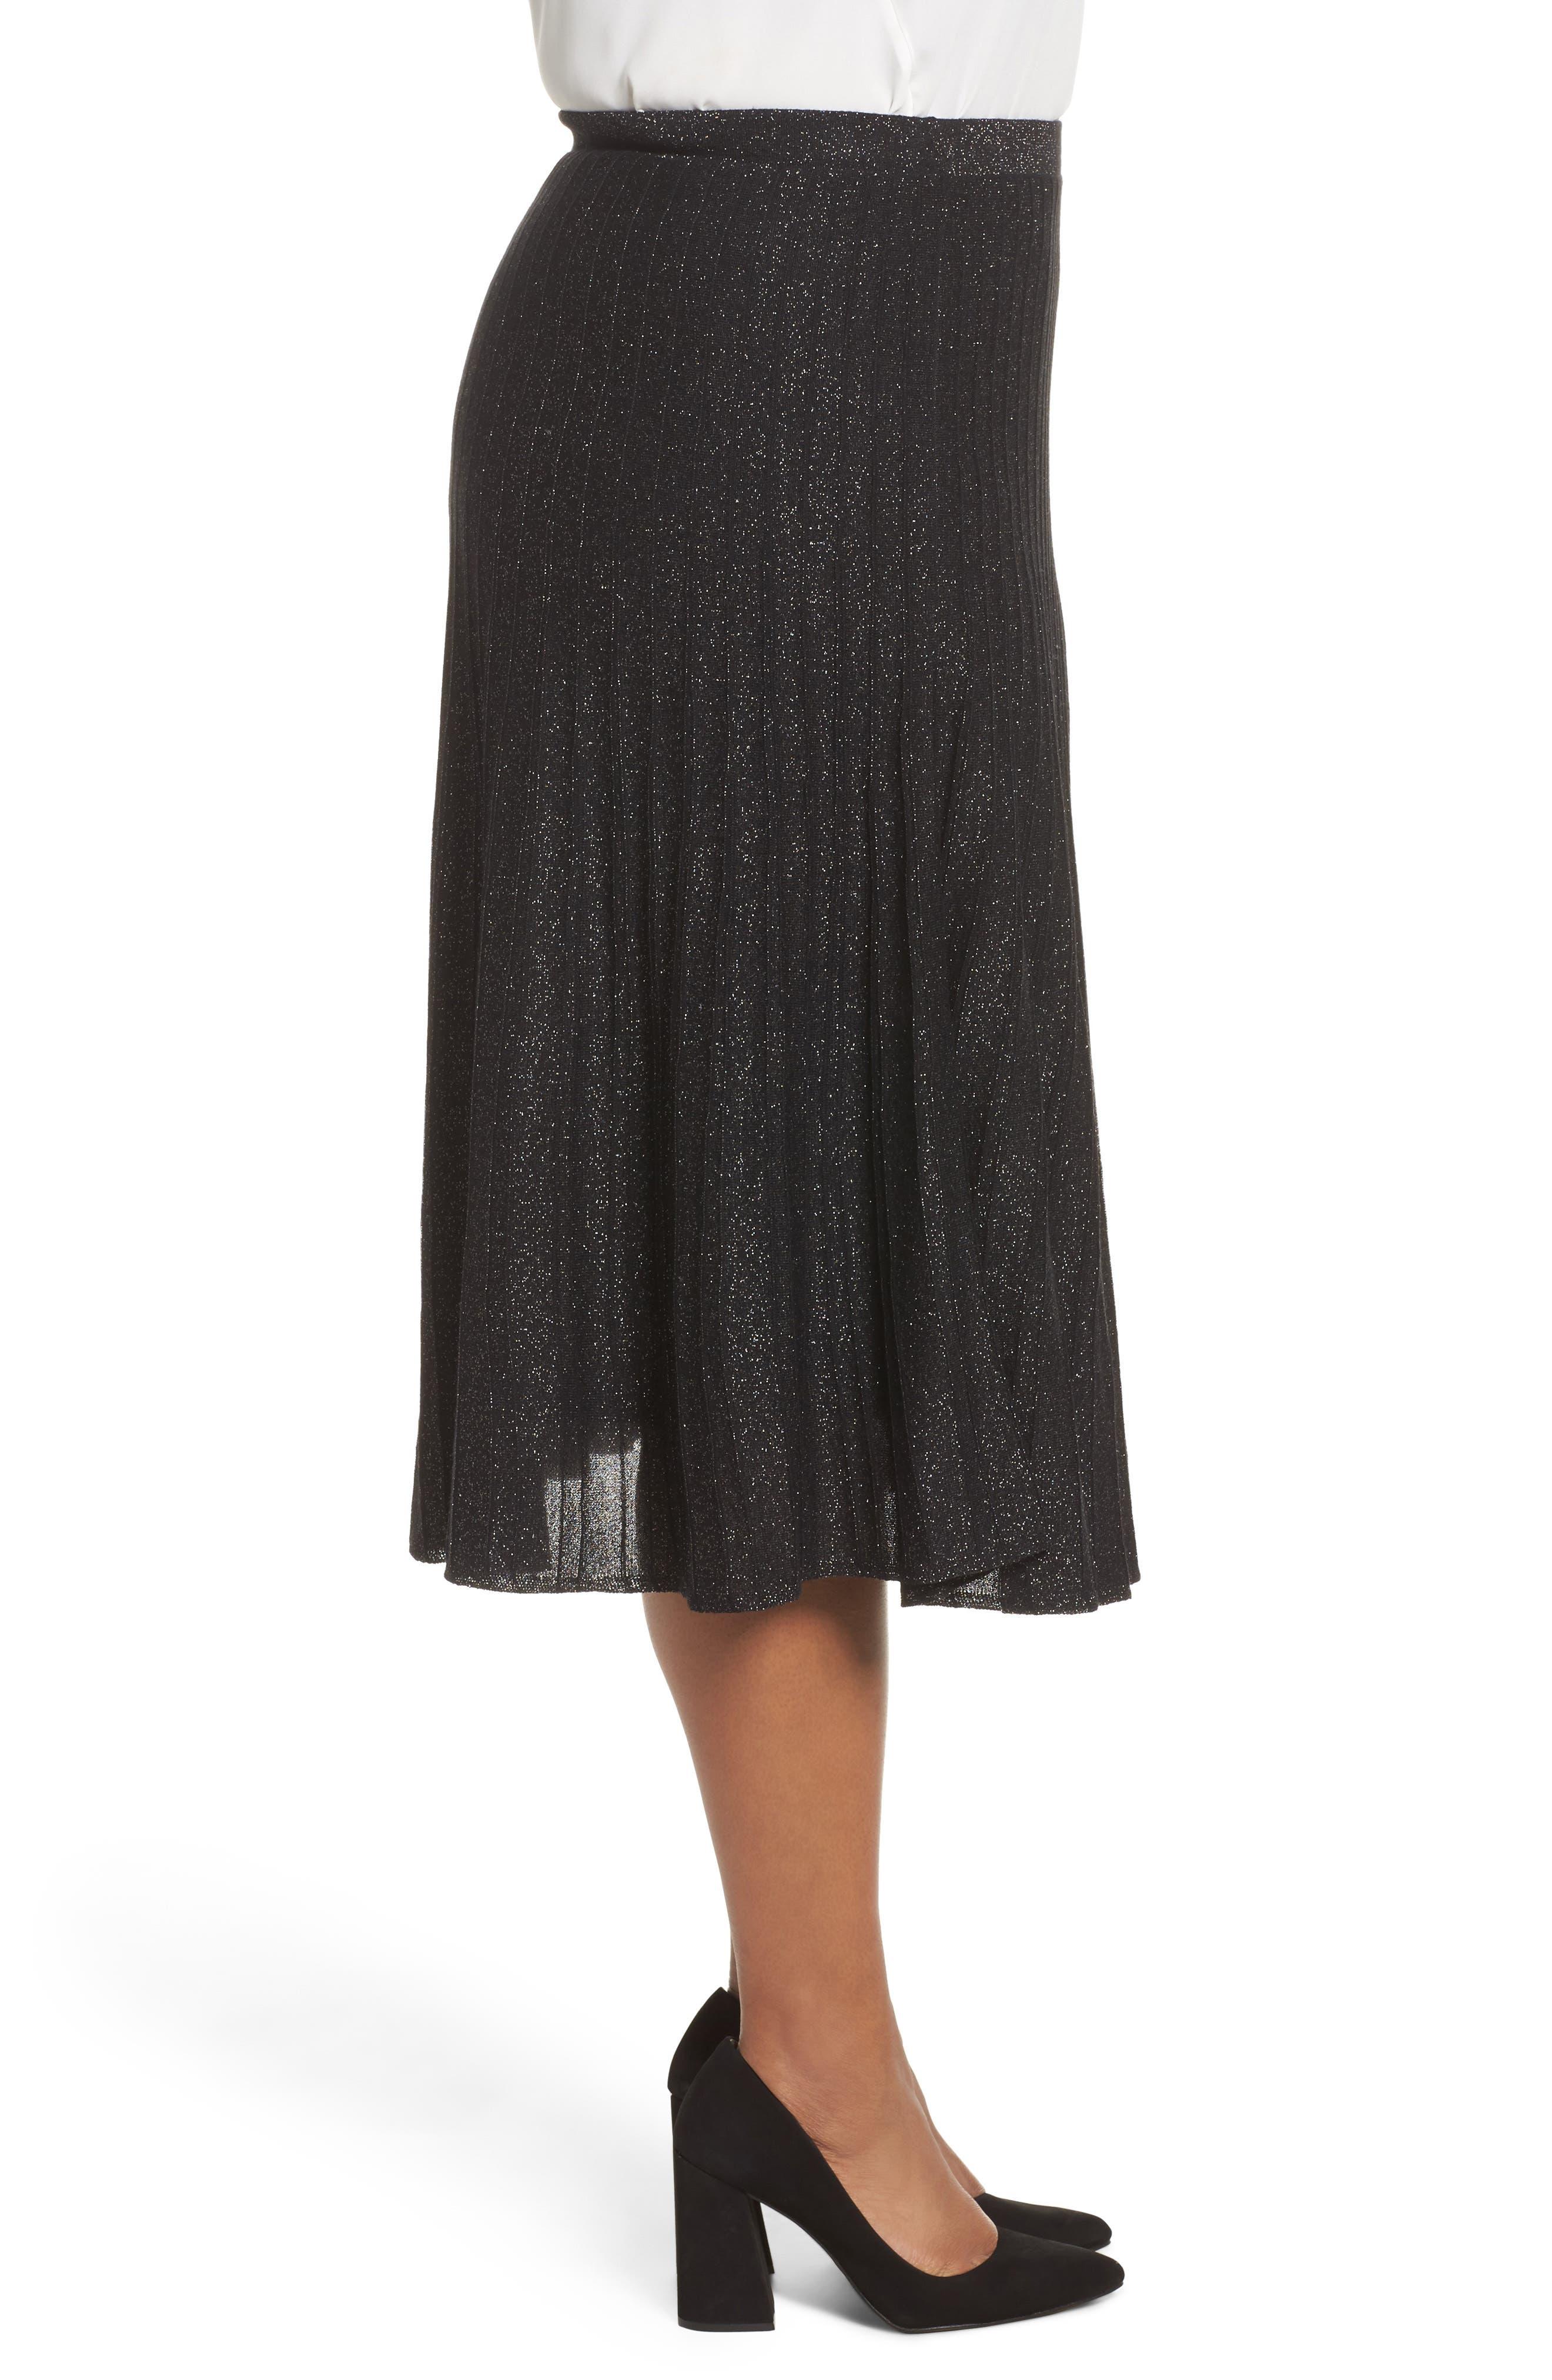 Luminary Skirt,                             Alternate thumbnail 3, color,                             Black Mix